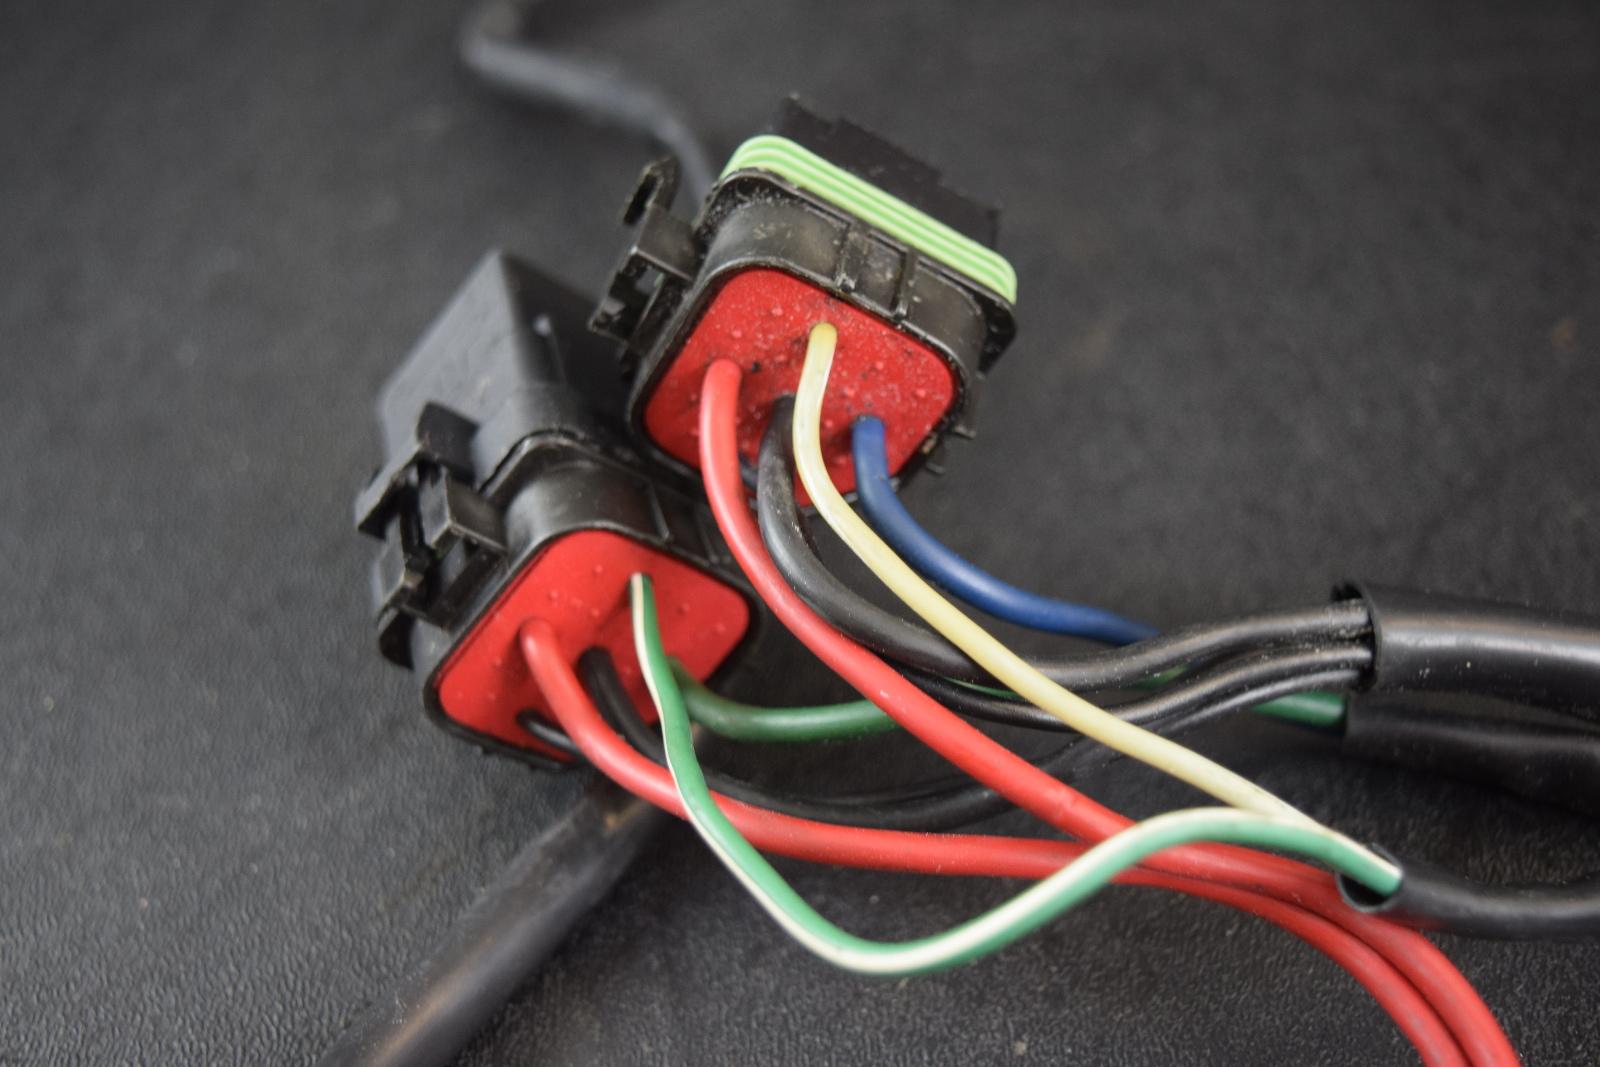 23503 ptp 1991 1995 mercury force power trim wiring harness w 1 relay 819514a2 40 50 70 hp 4 1984 1999 mercury force power trim wiring harness w 1 relay yamaha trim gauge wiring harness at readyjetset.co